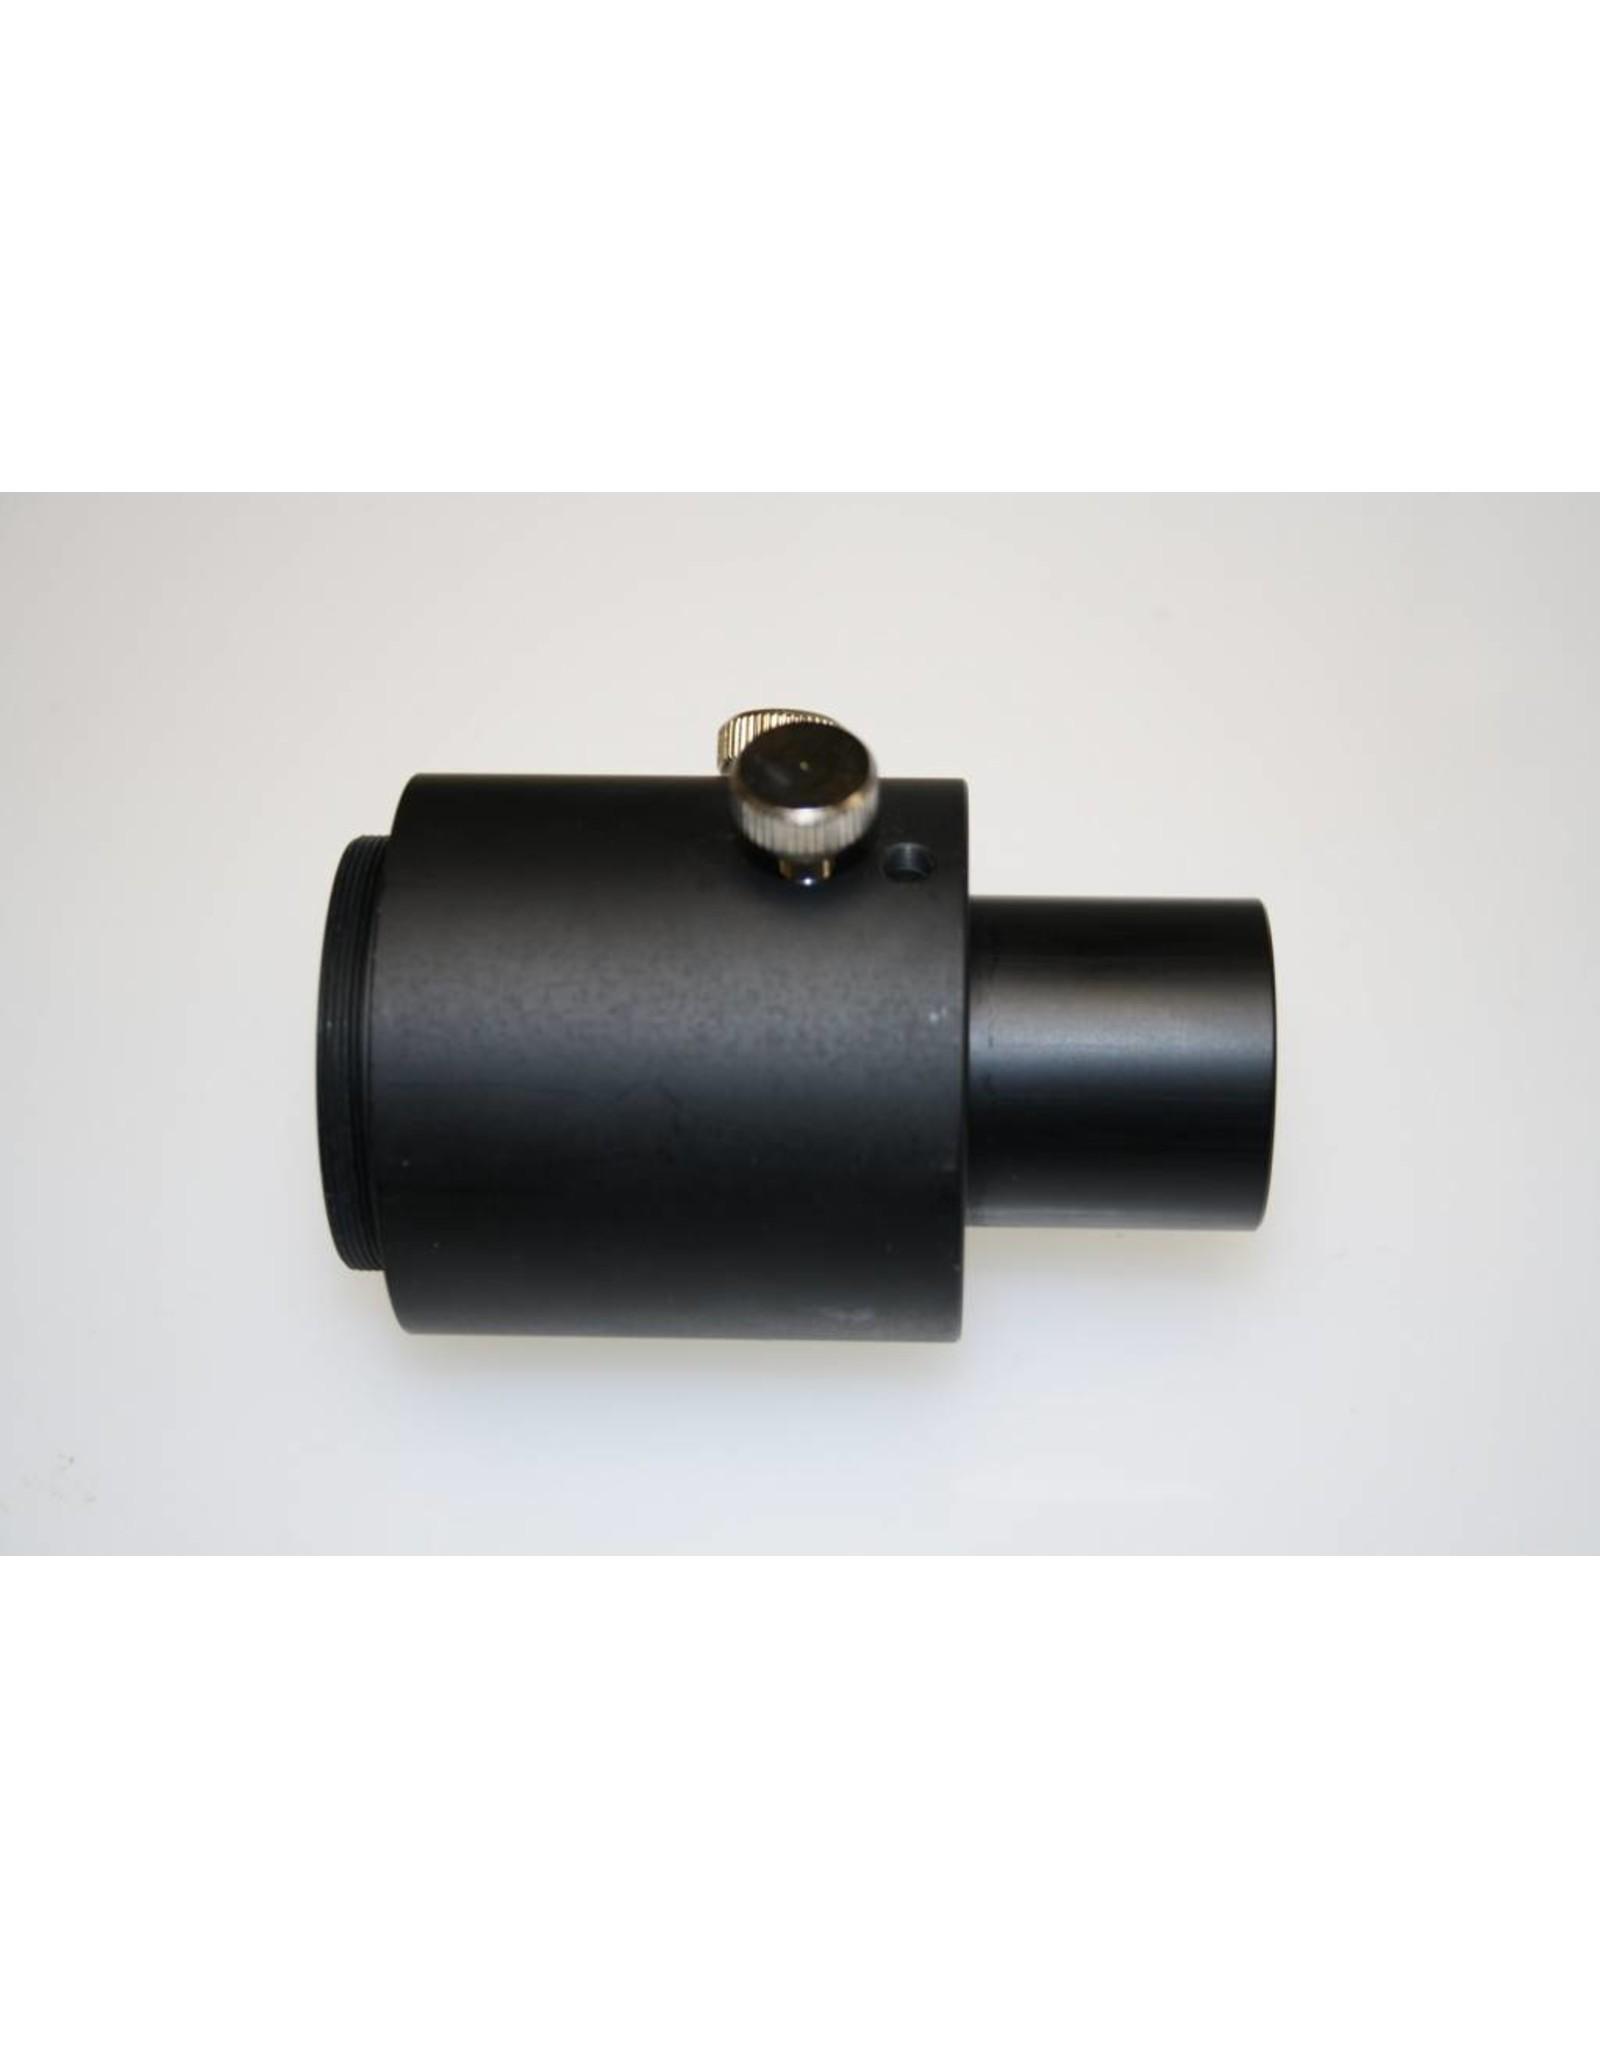 Scopetronix DIGADAPT Eyepiece Projection Adapter